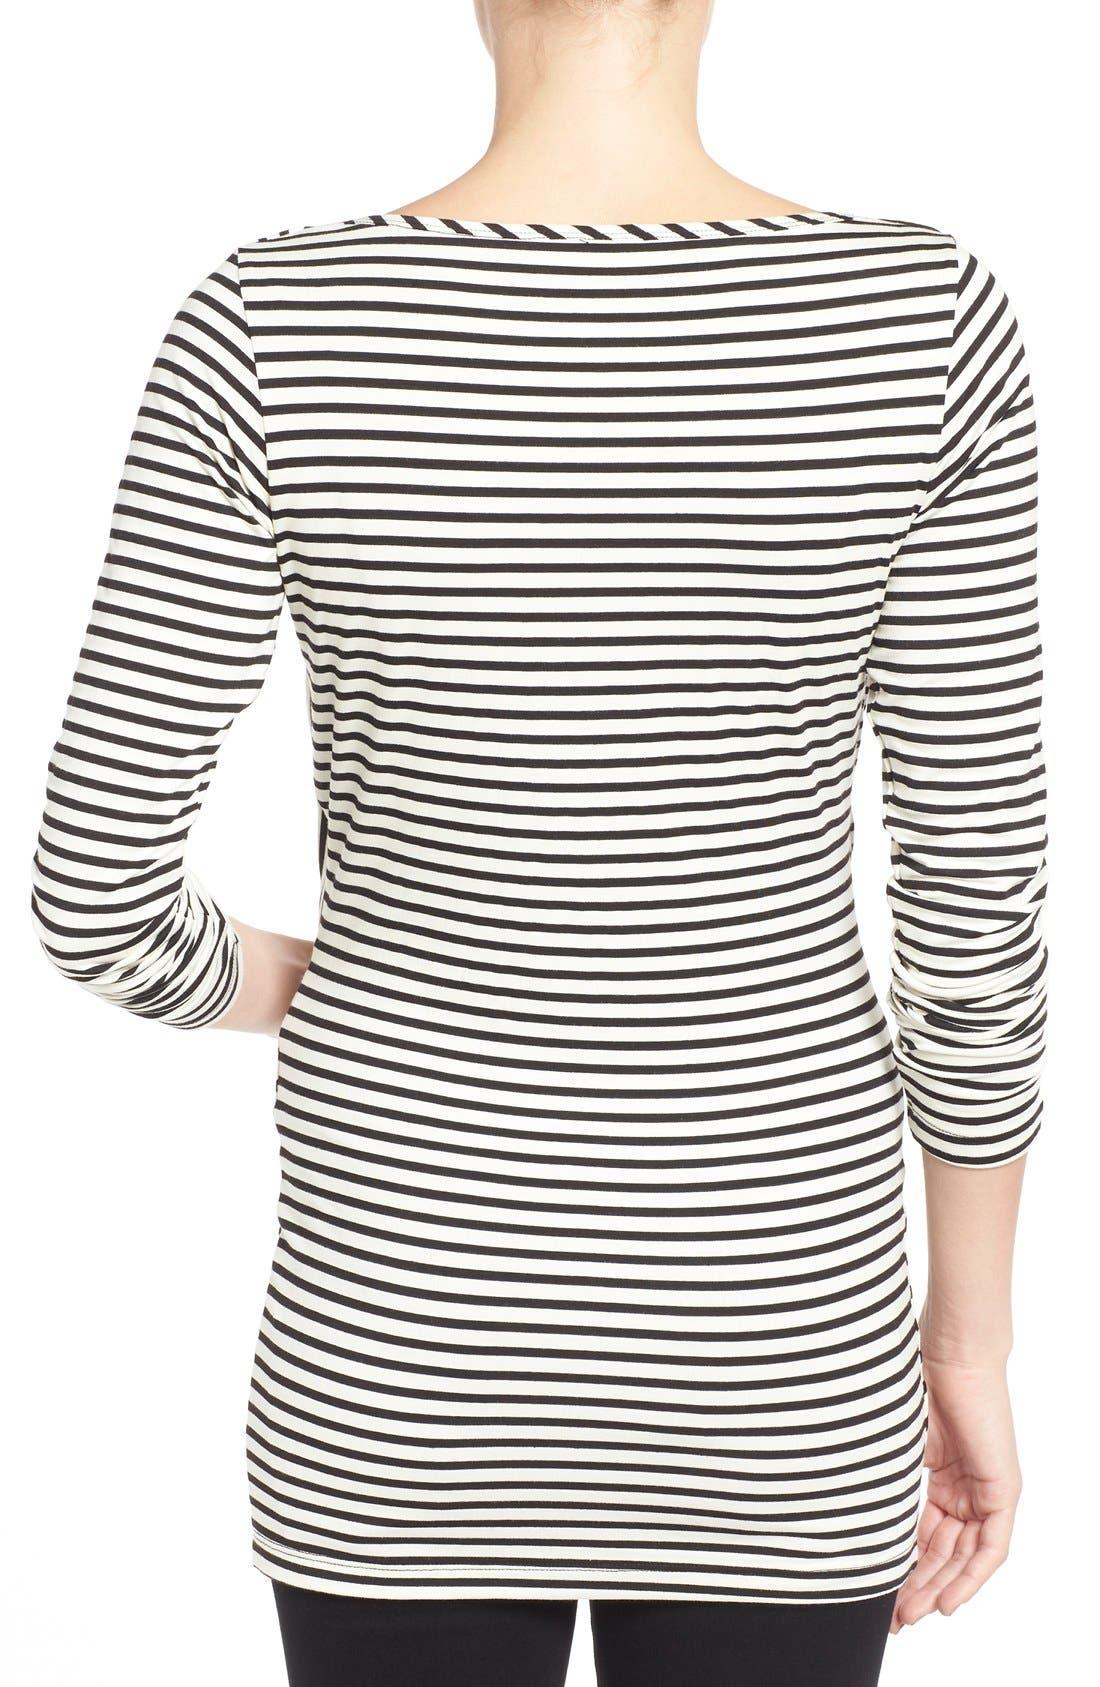 'Anne' Drape Neck Nursing Top,                             Alternate thumbnail 2, color,                             Black/ White Stripe